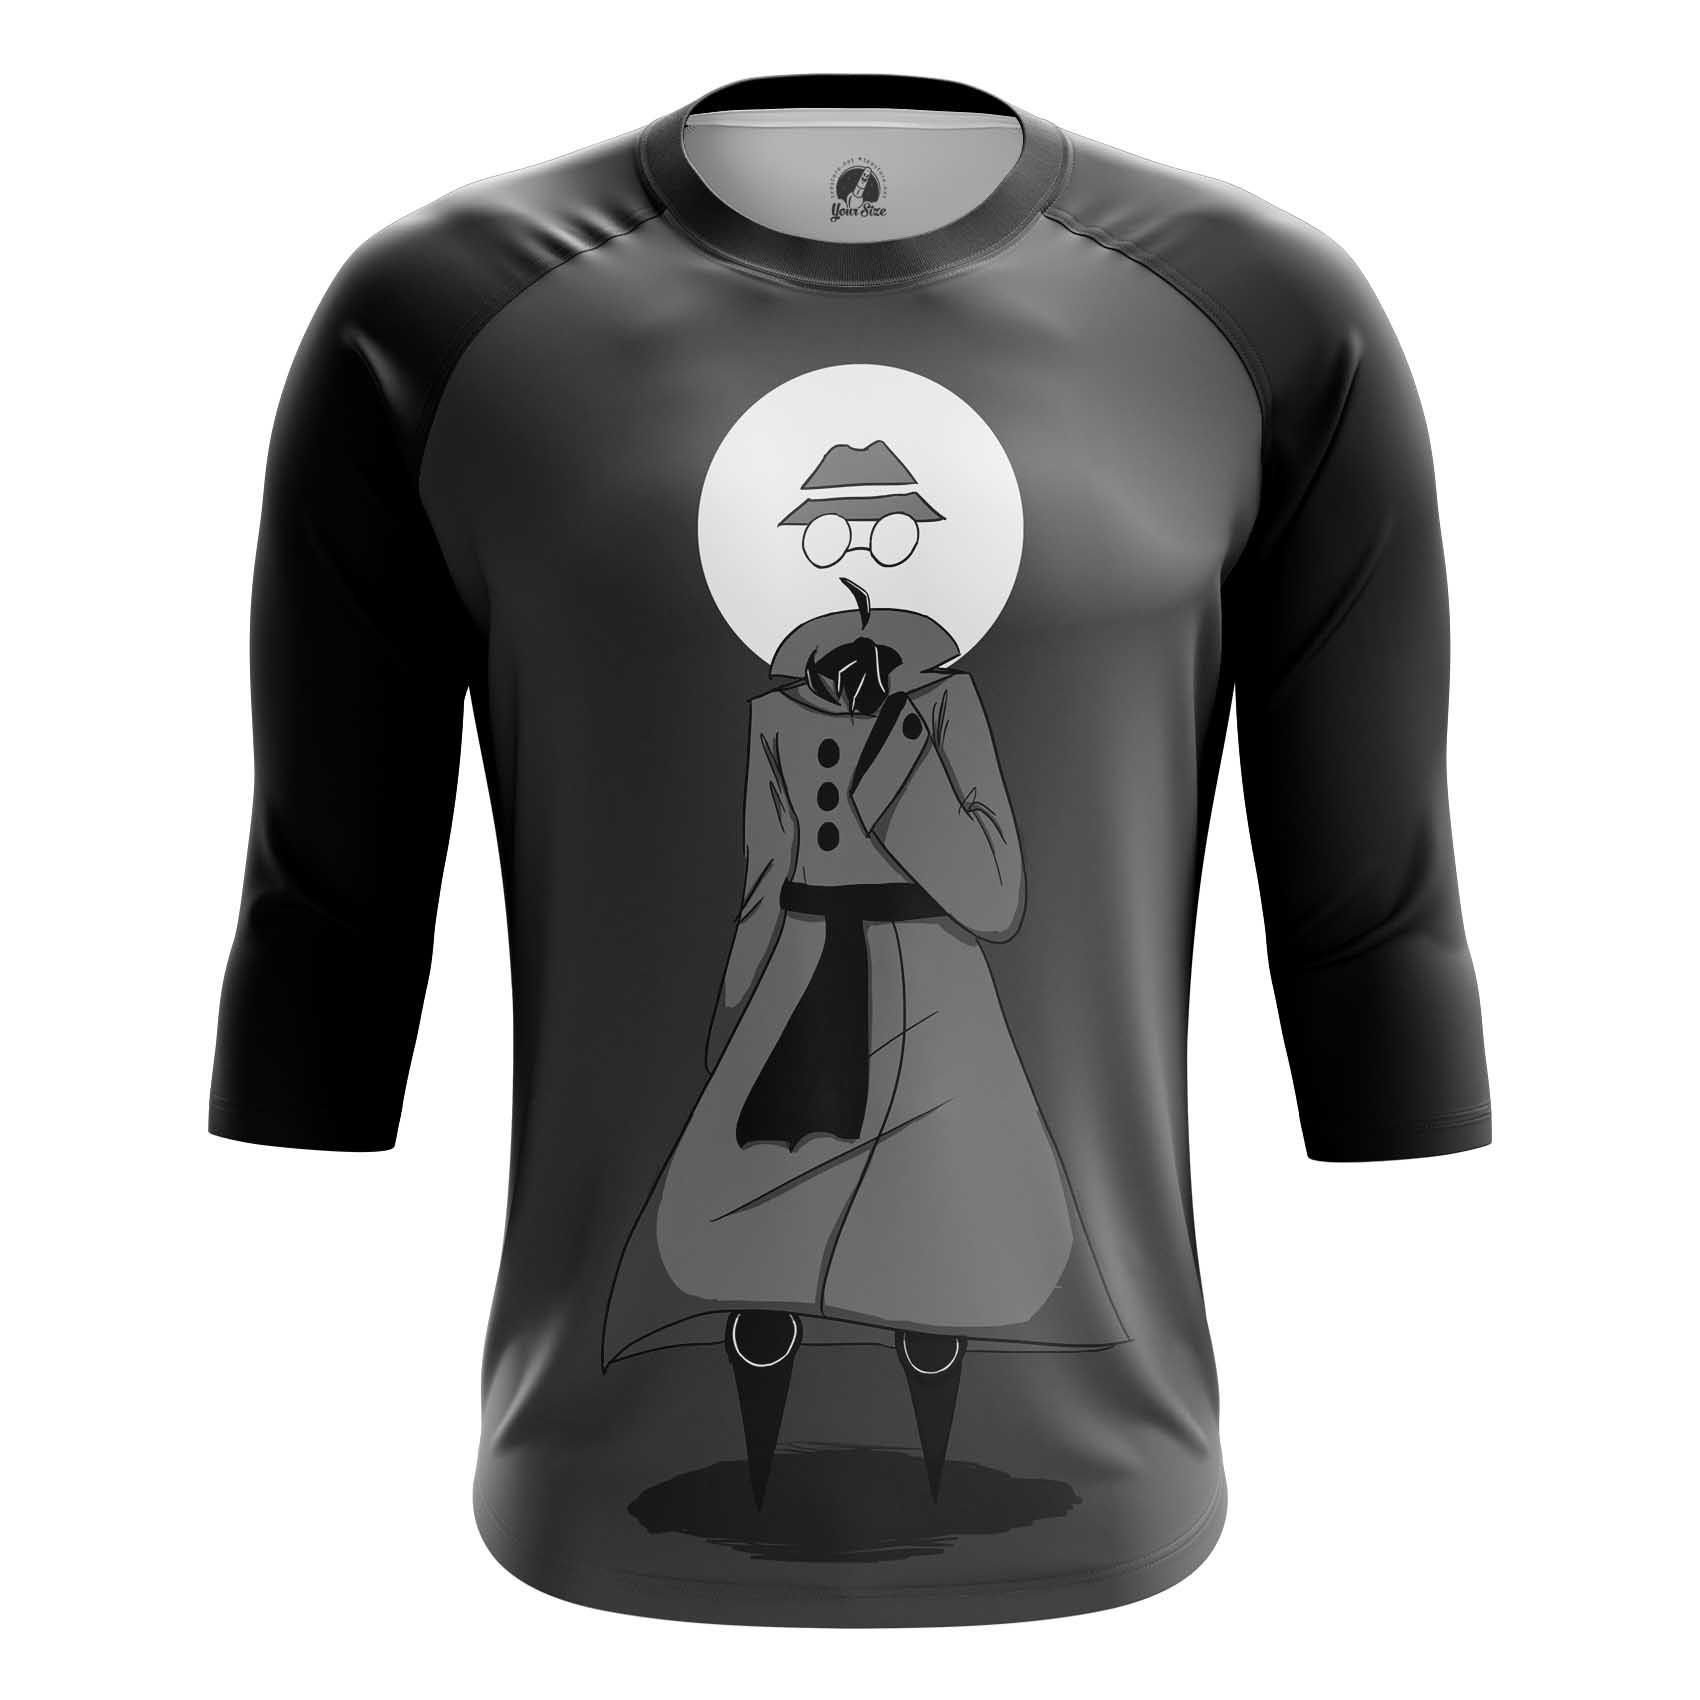 Merch Men'S T-Shirt Privacy Spy Mode Incognito Web Fun Art Merch